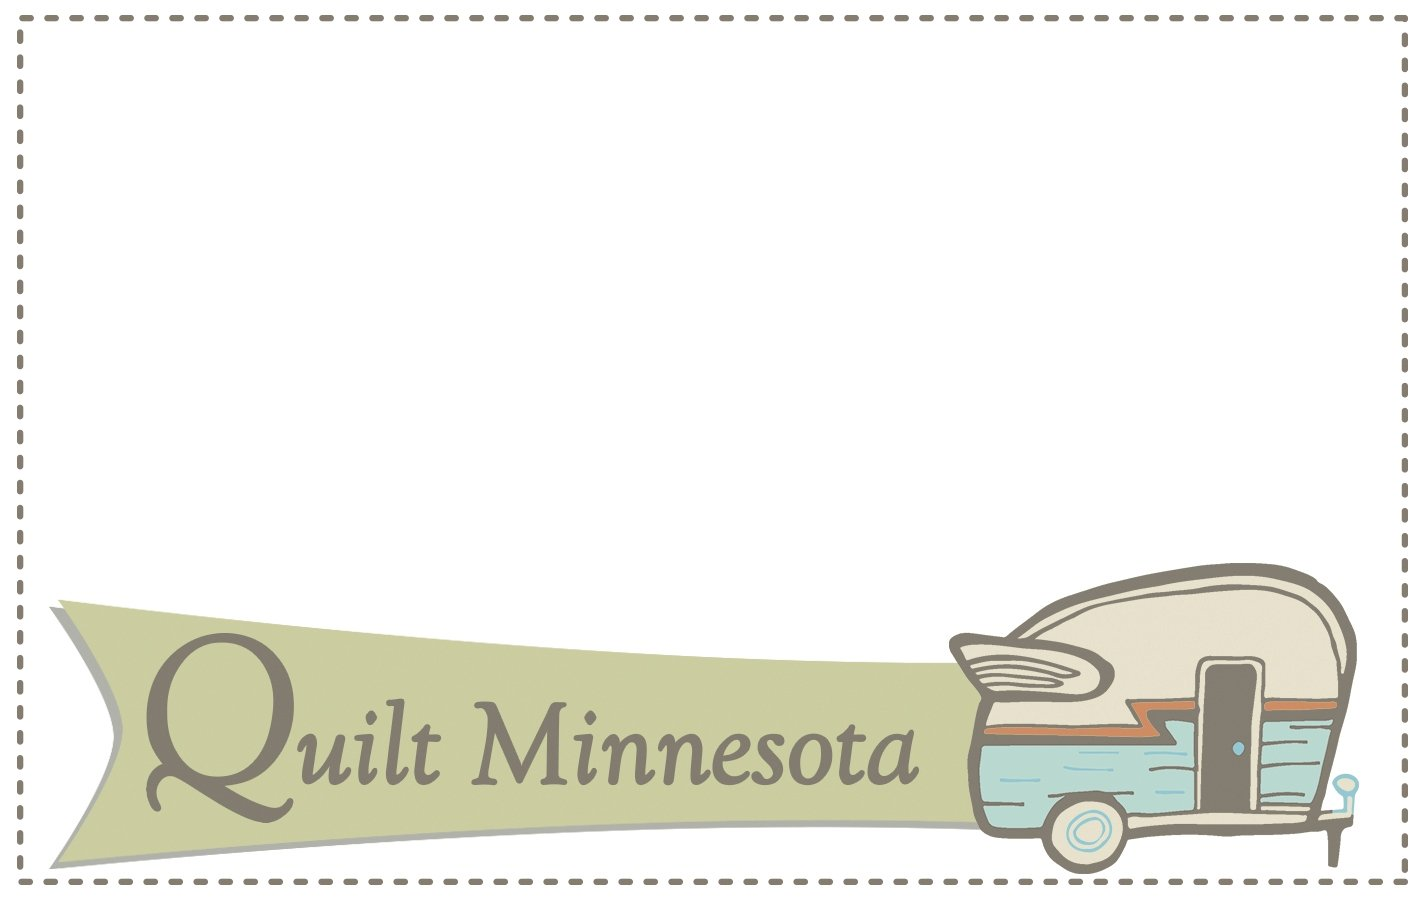 Quilt Minnesota 2016 Quilt Label, Camper